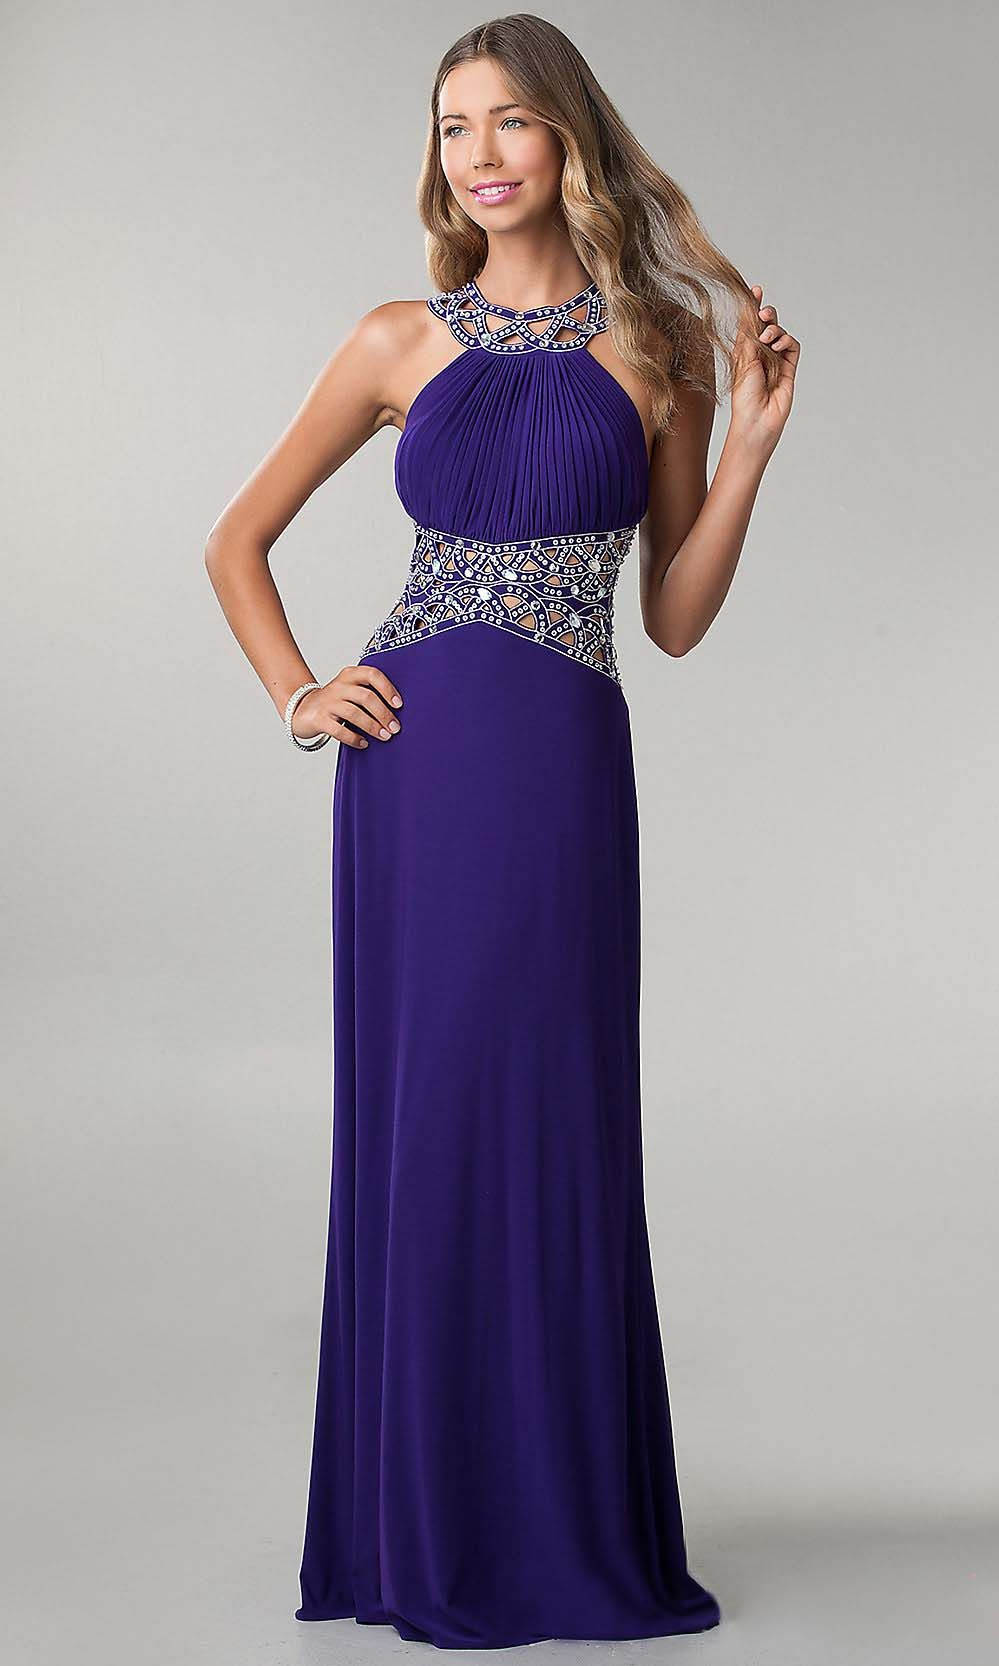 loop prom dresses, royal blue prom dress, elegant prom dresses ...